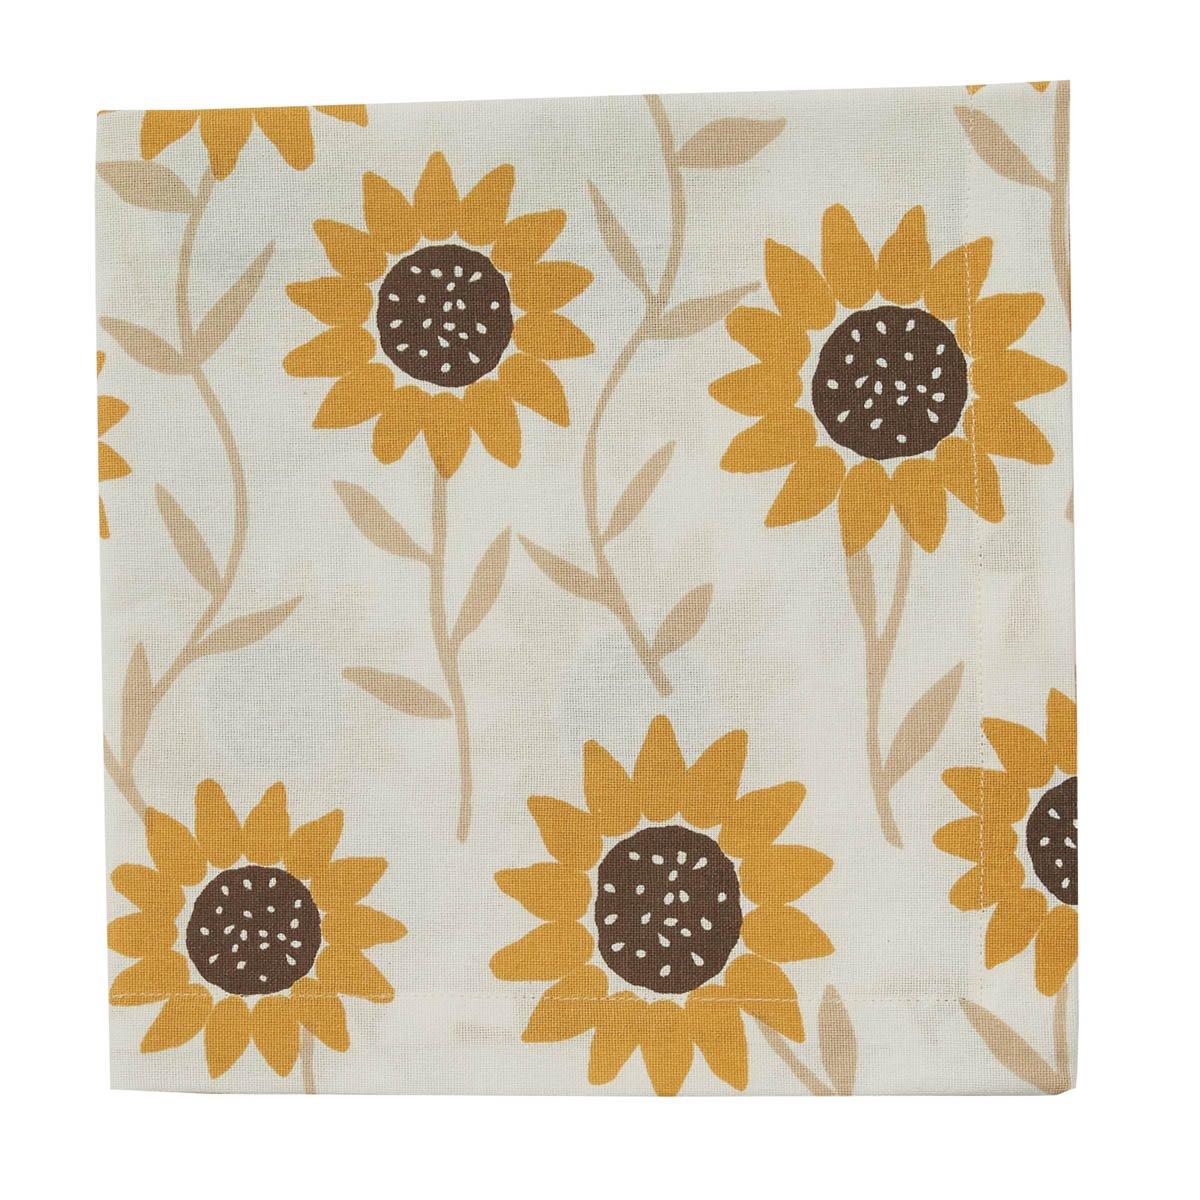 Sunflower Print Napkin